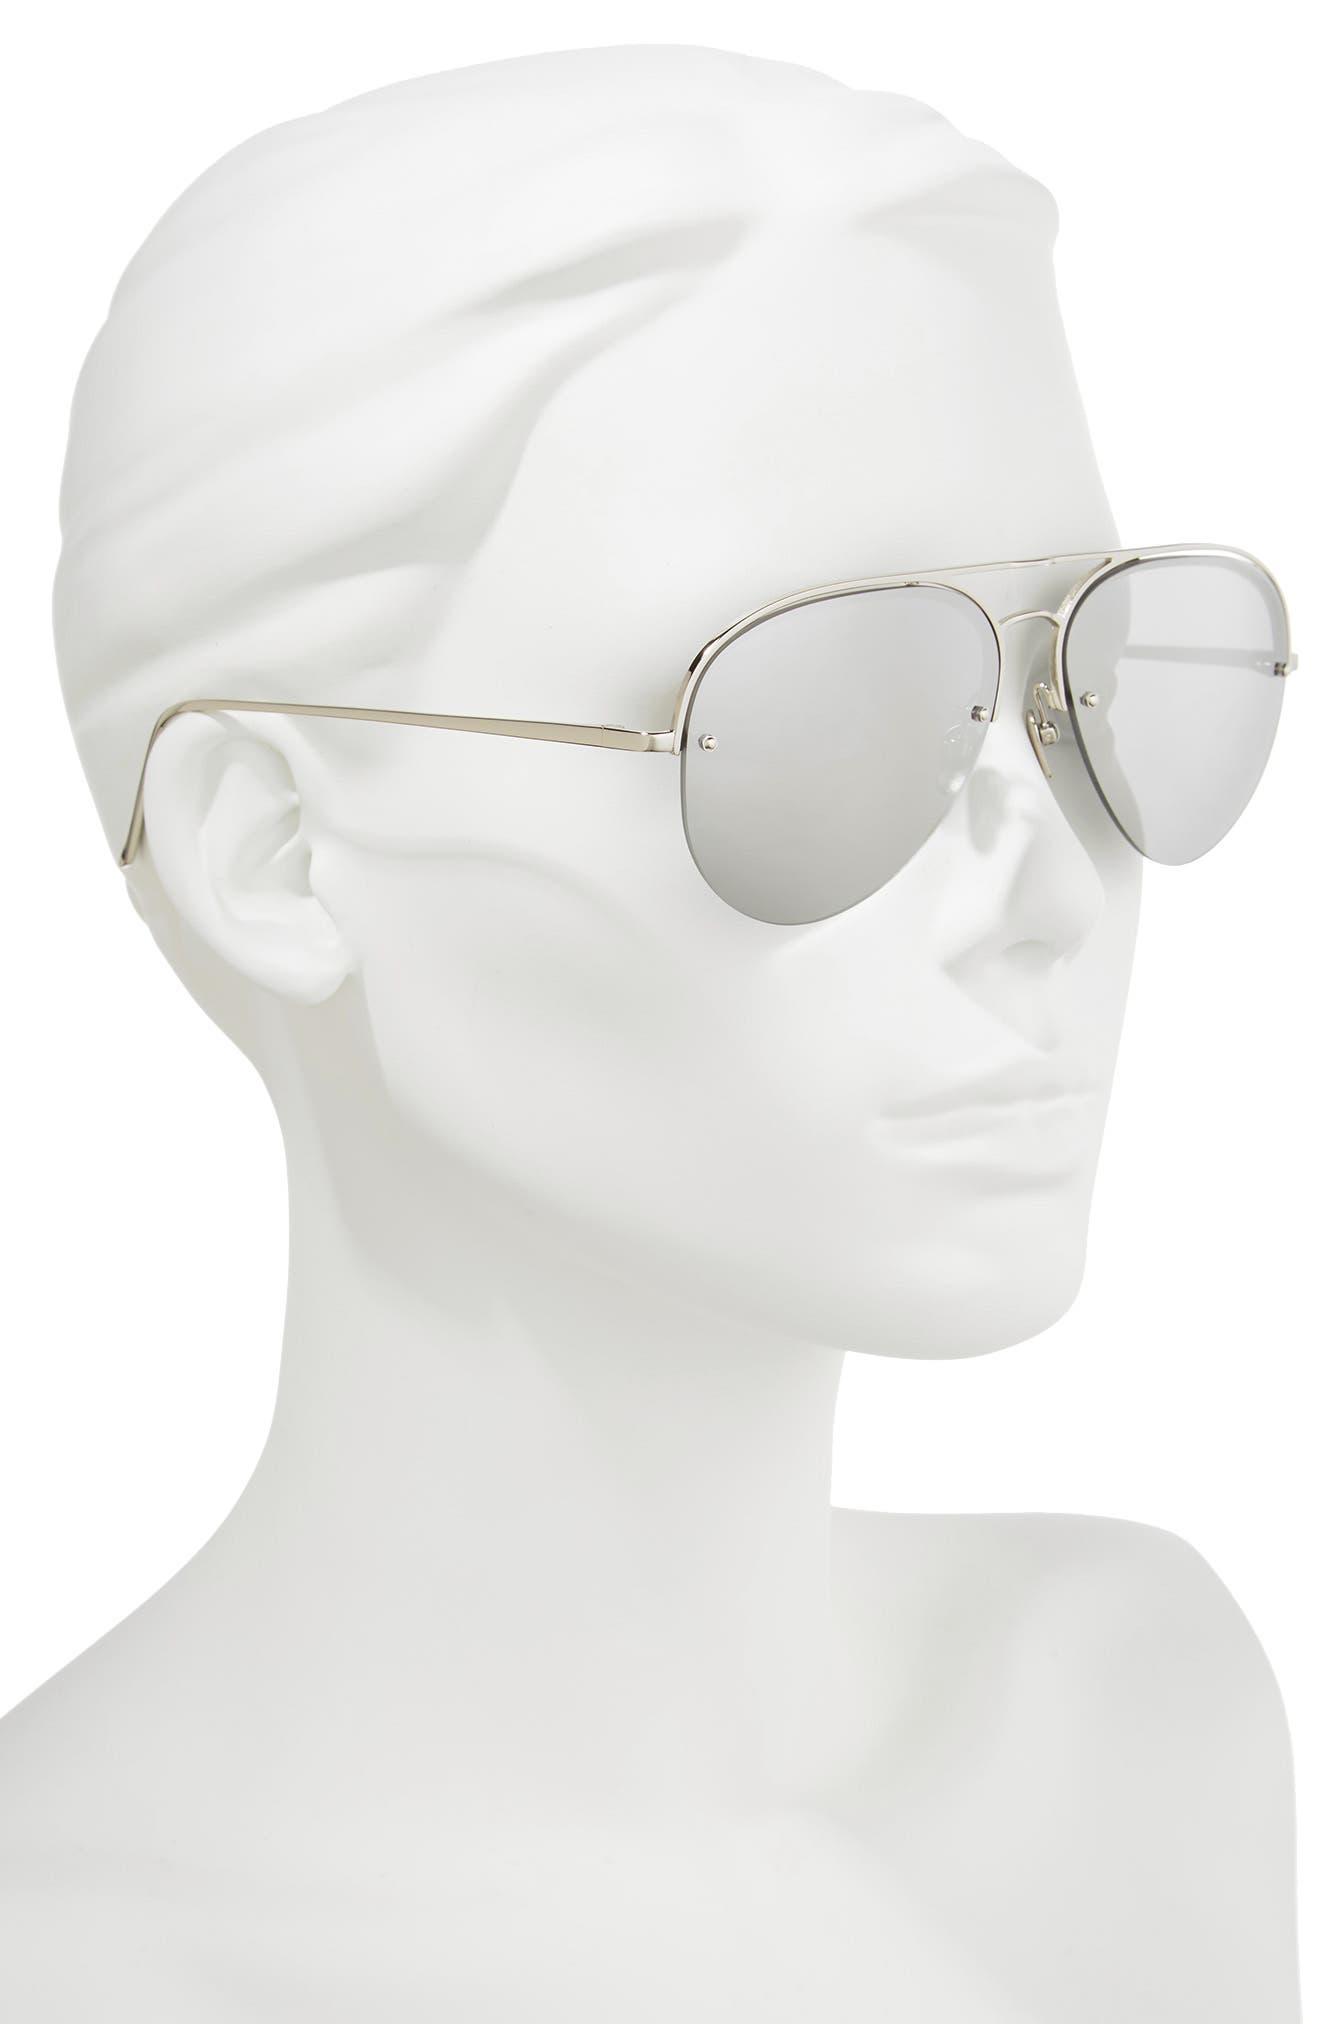 60mm Mirrored 18 Karat Gold Aviator Sunglasses,                             Alternate thumbnail 2, color,                             White Gold/ Platinum